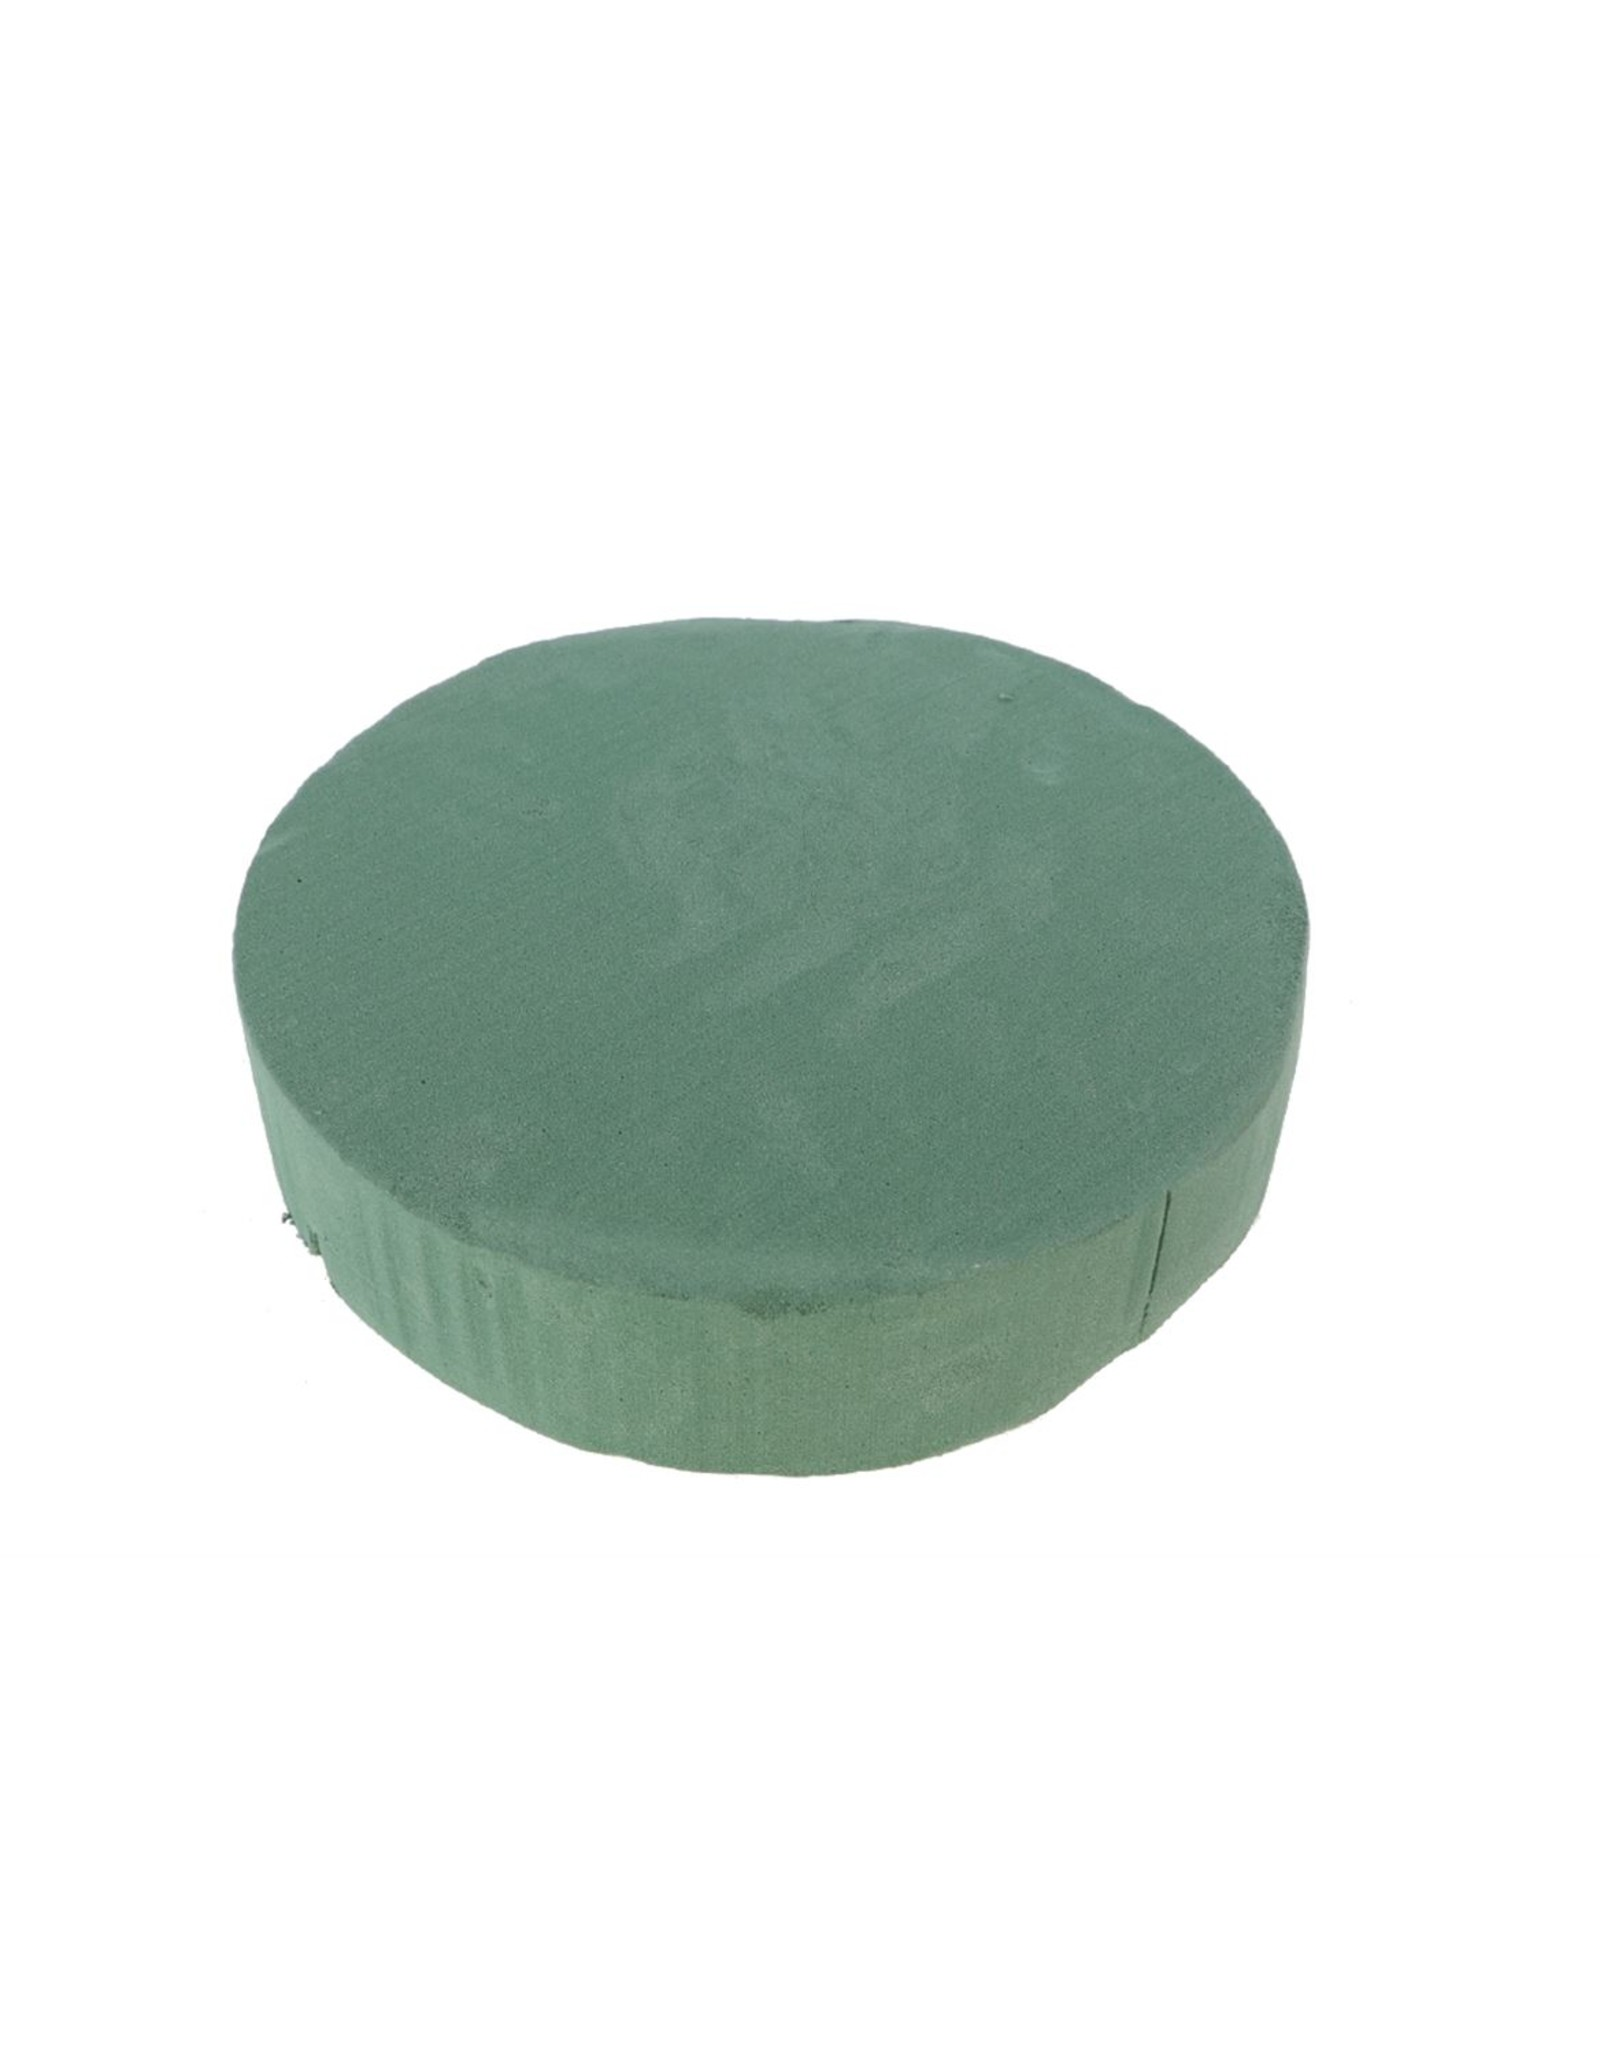 HD Basic Cake Sld Foam Ø30.0 ↑7.0 (x 8)